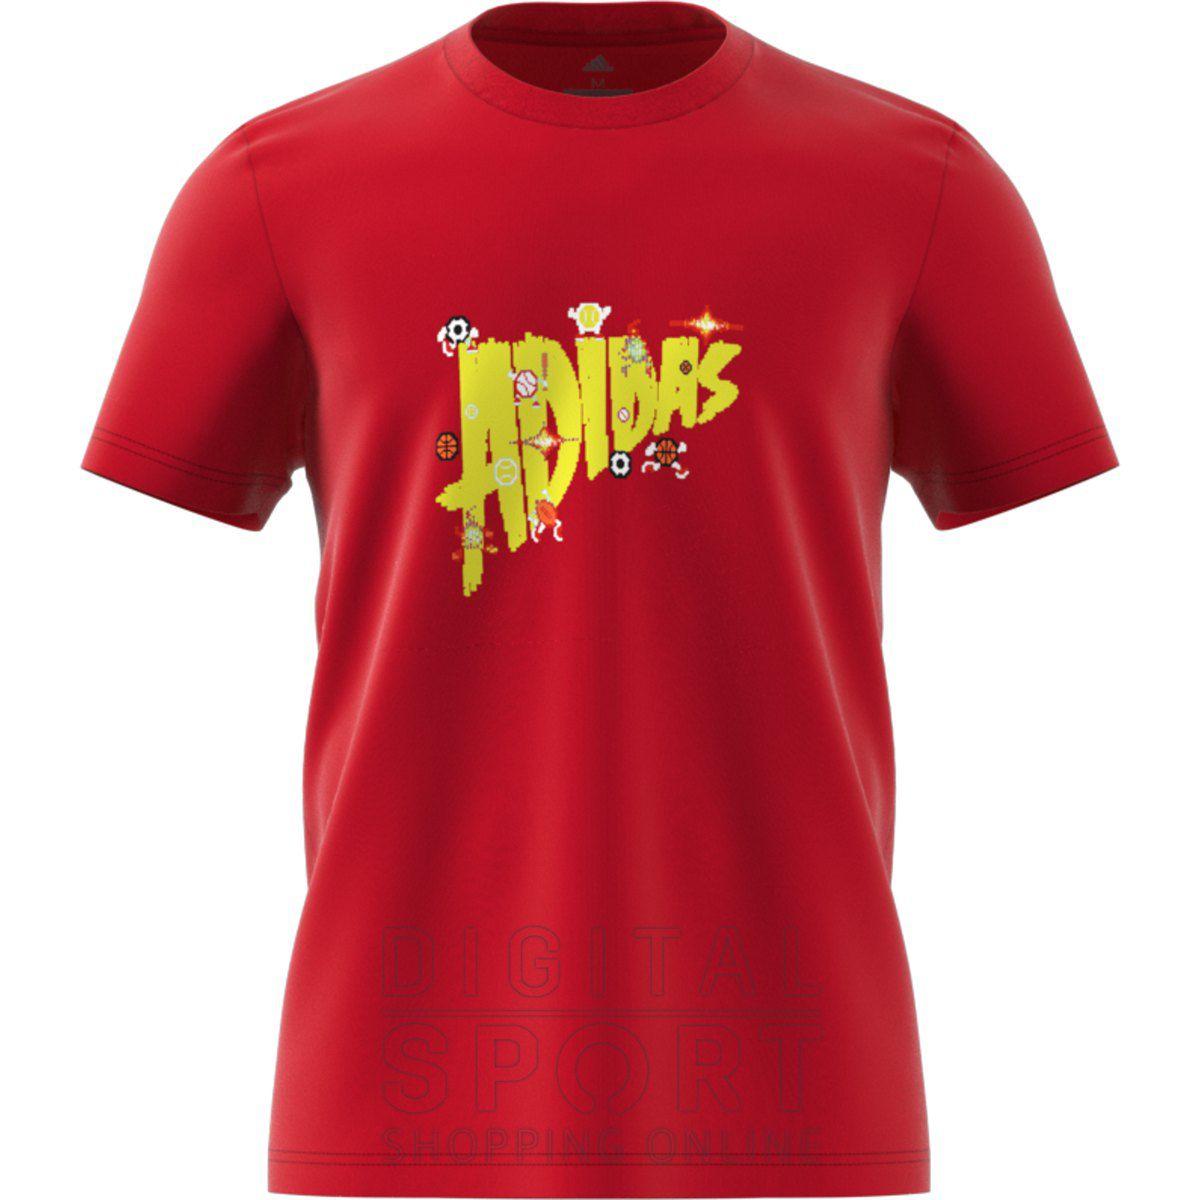 Camiseta Adidas Lineage Masculina - Vermelha